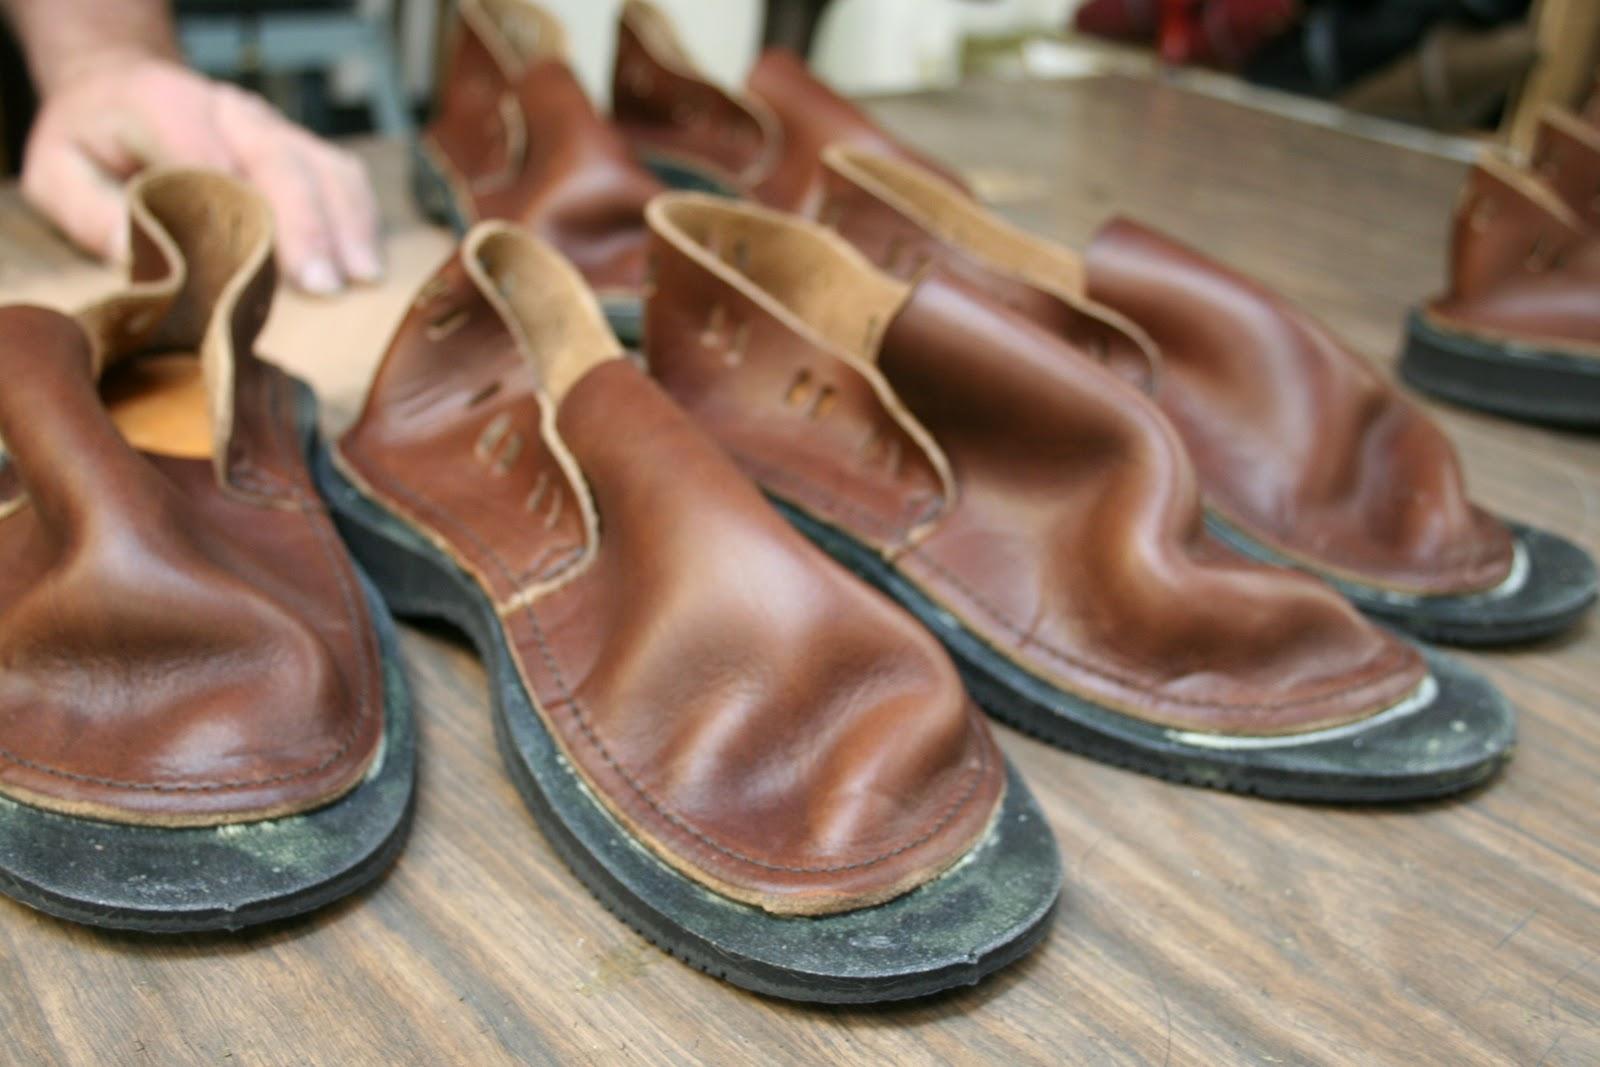 shoe company american handmade leather shoes